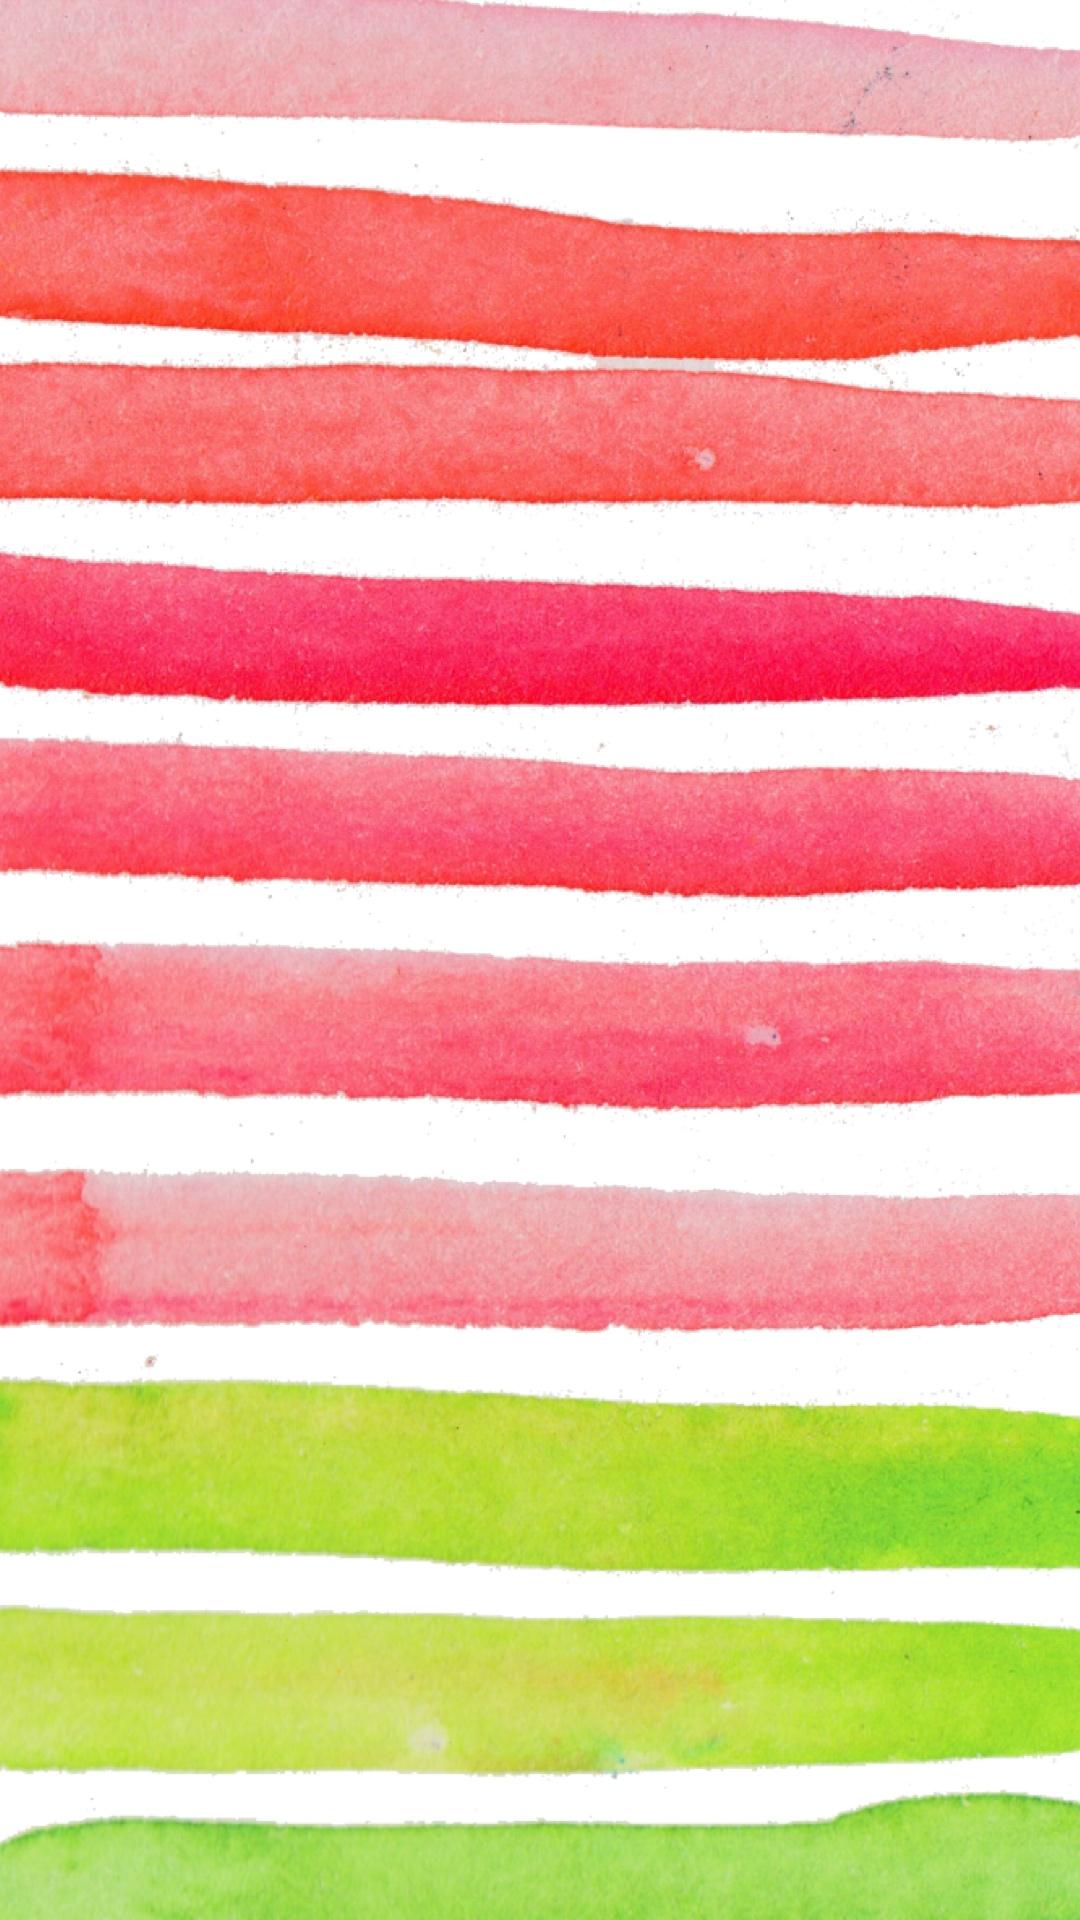 Phone Wallpaper Strawberry Fields Watercolor